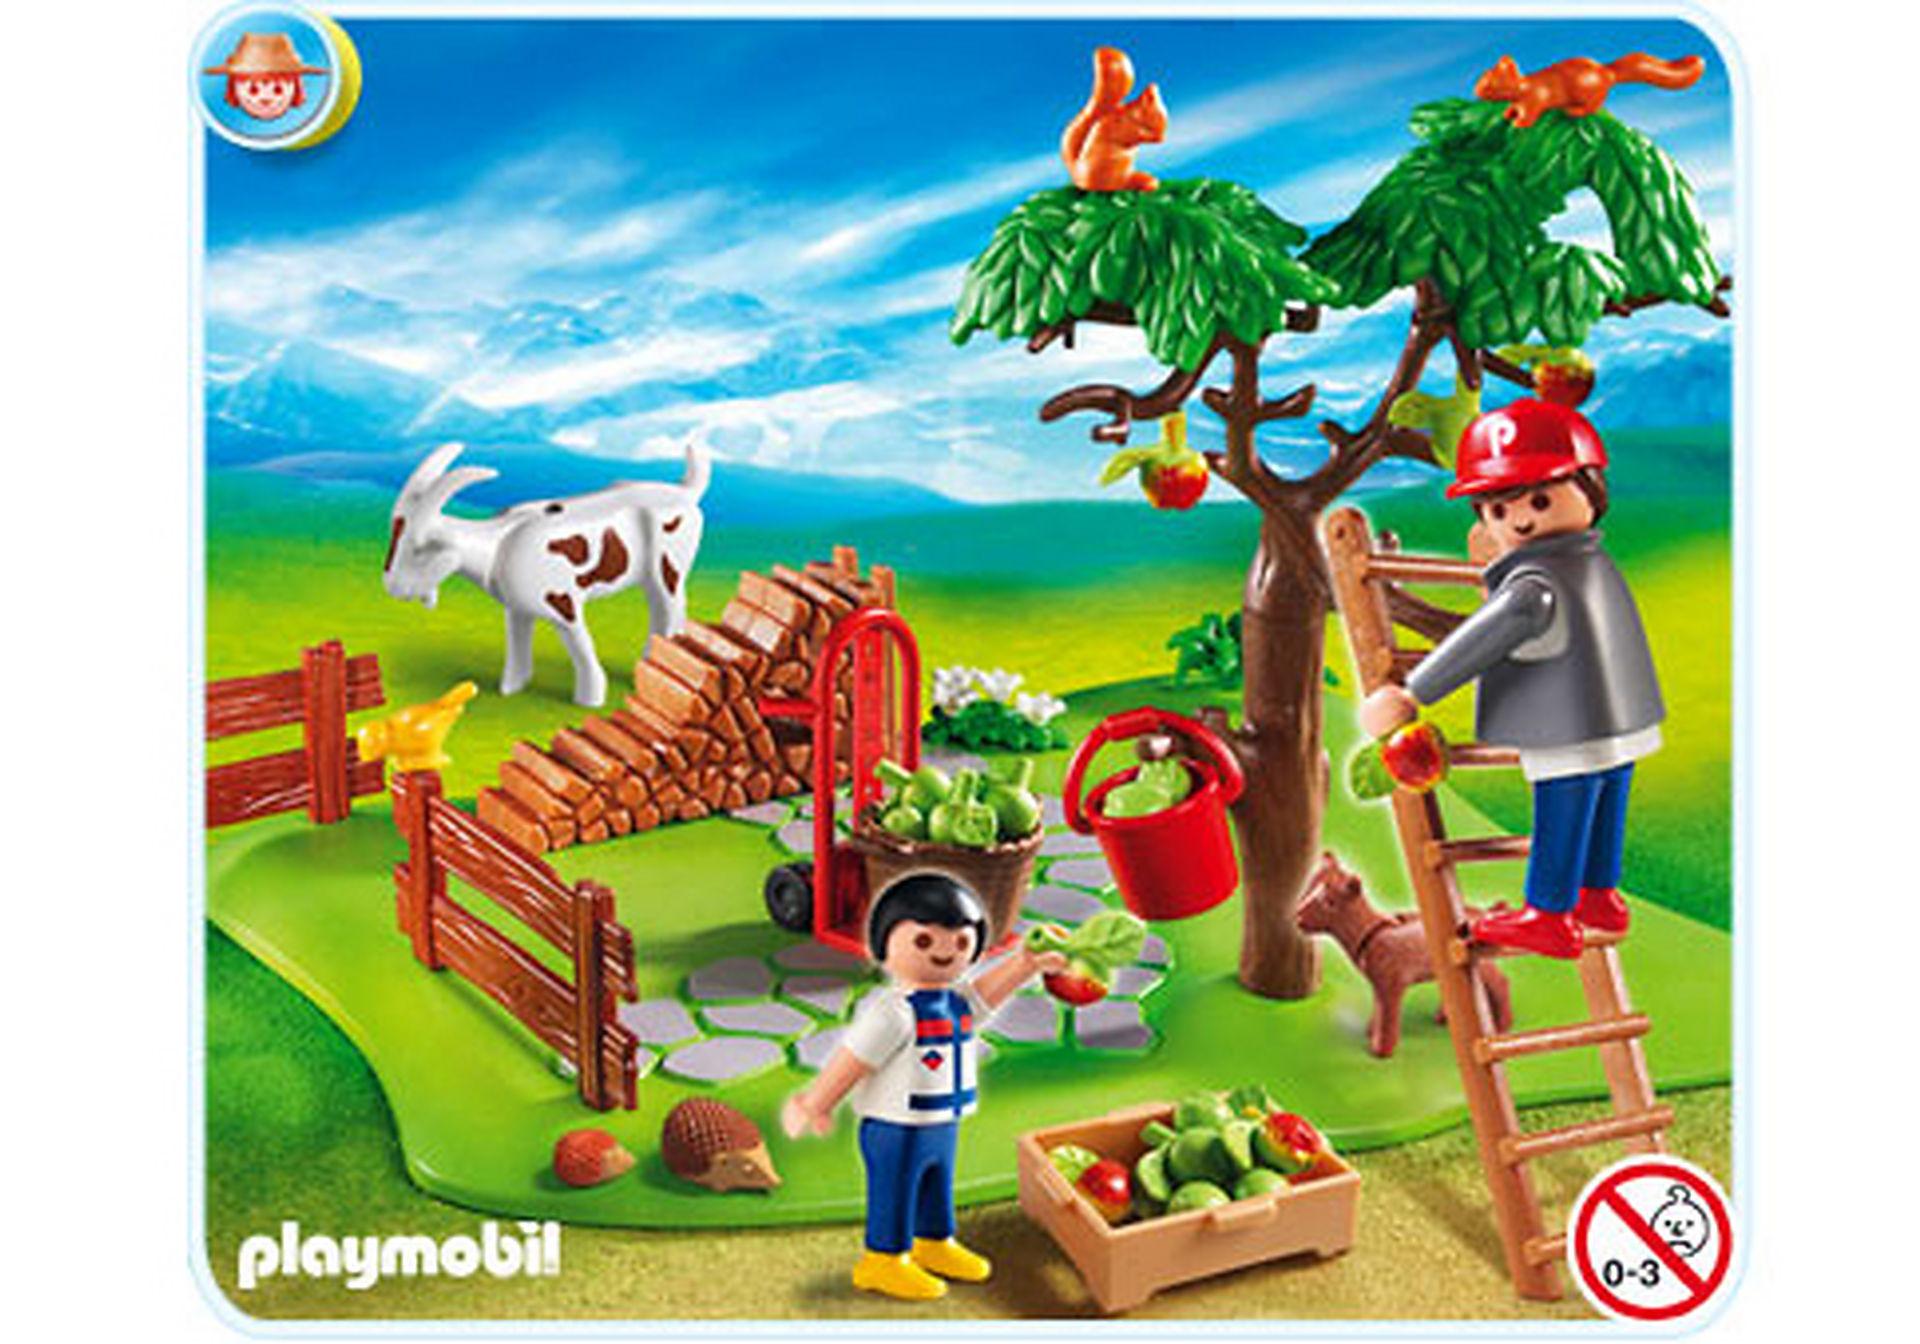 http://media.playmobil.com/i/playmobil/4146-A_product_detail/KompaktSet Apfelernte